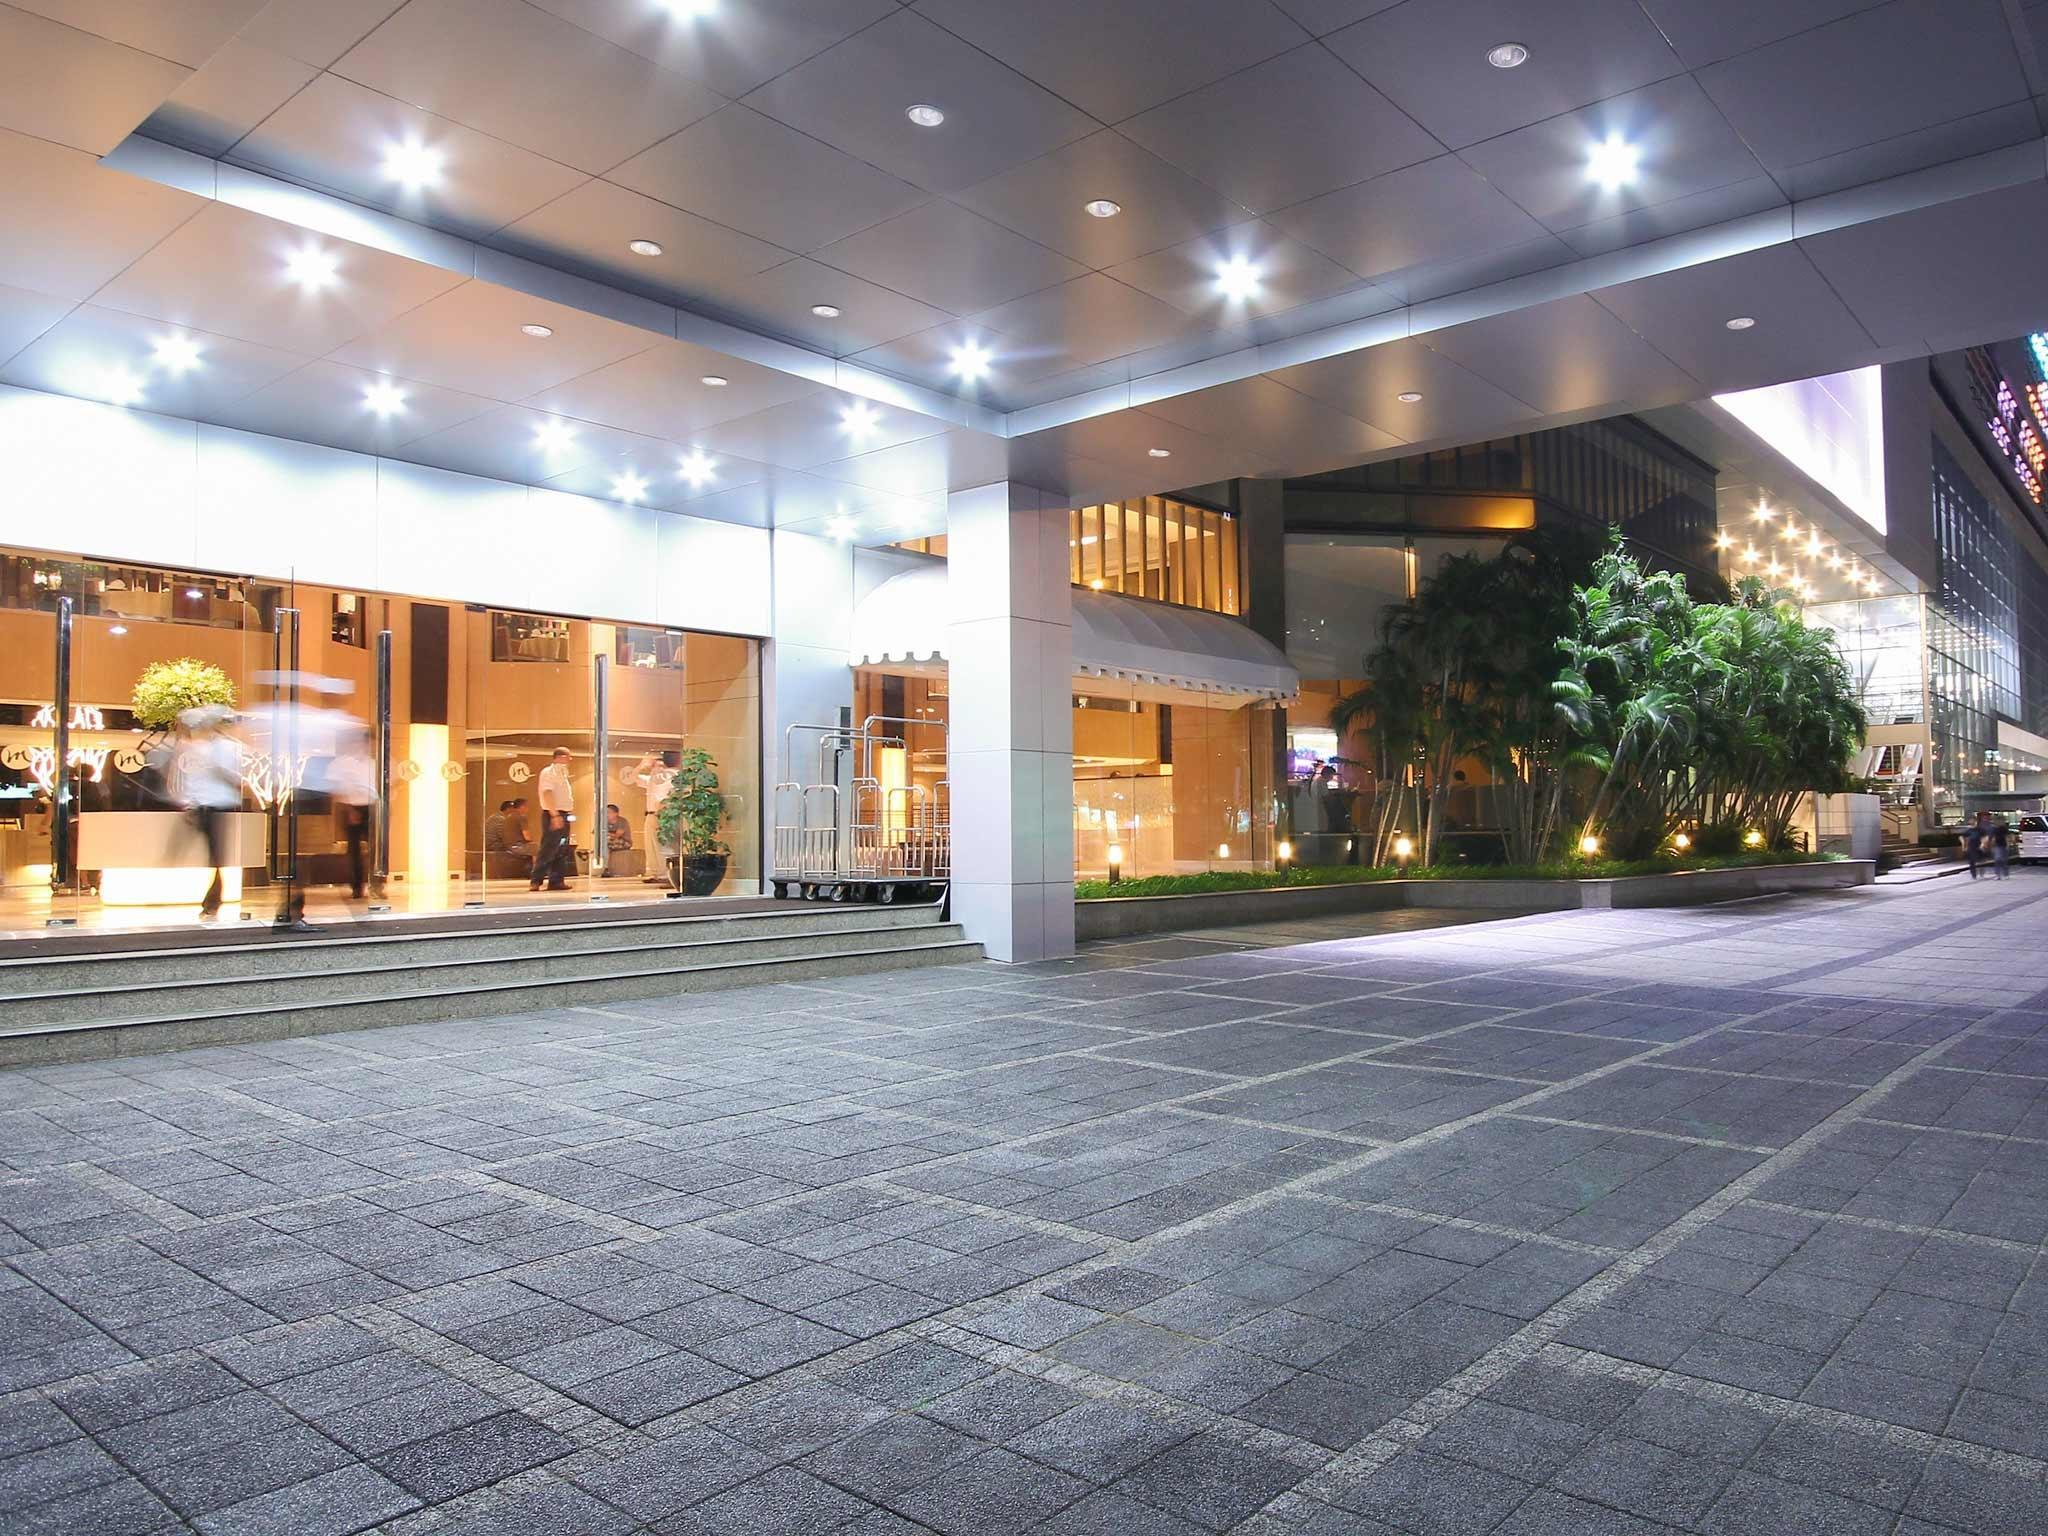 Grand Mercure Bangkok Fortune แกรนด์ เมอร์เคียว กรุงเทพฯ ฟอร์จูน